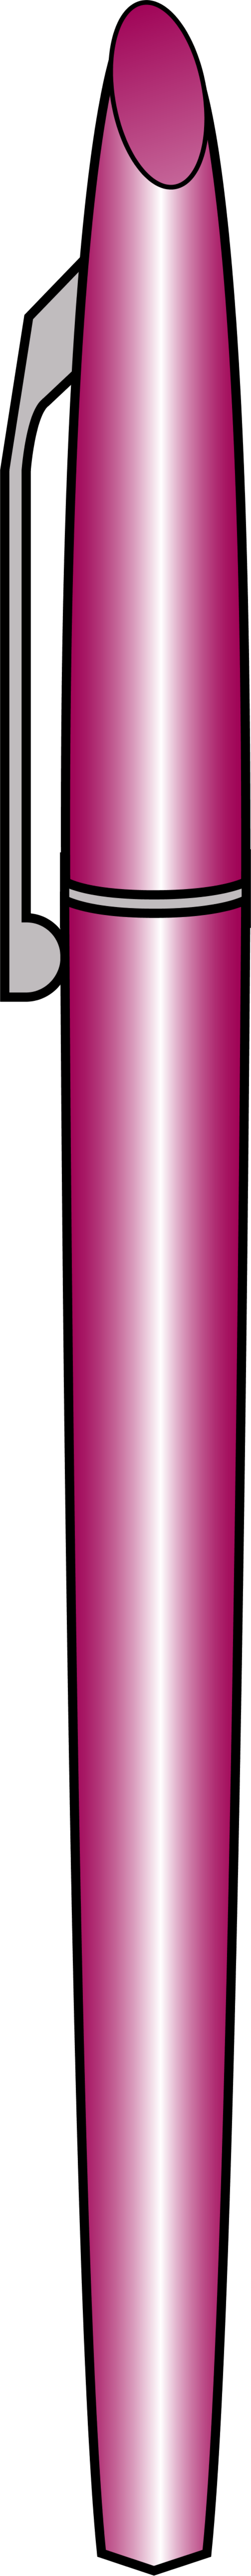 Clipart pen horizontal. Color cliparts free download